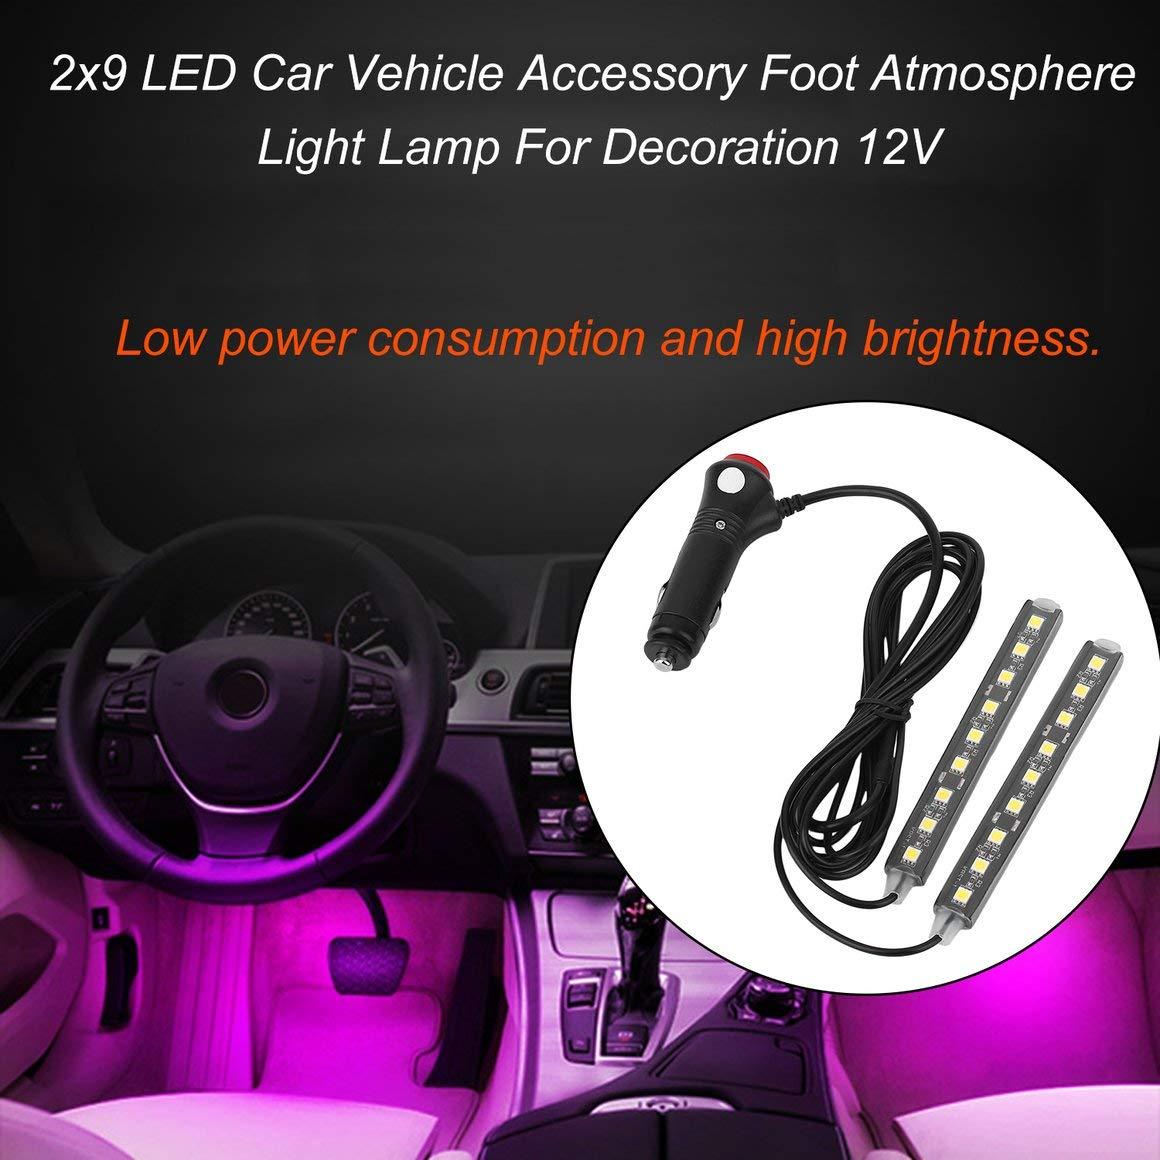 luz blanca Funnyrunstore 2x9 LED 12V Car Styling Interior Dash Piso Pie Decoraci/ón Luz L/ámpara Cigarrillo LED Atm/ósfera Luces Decoraci/ón L/ámpara